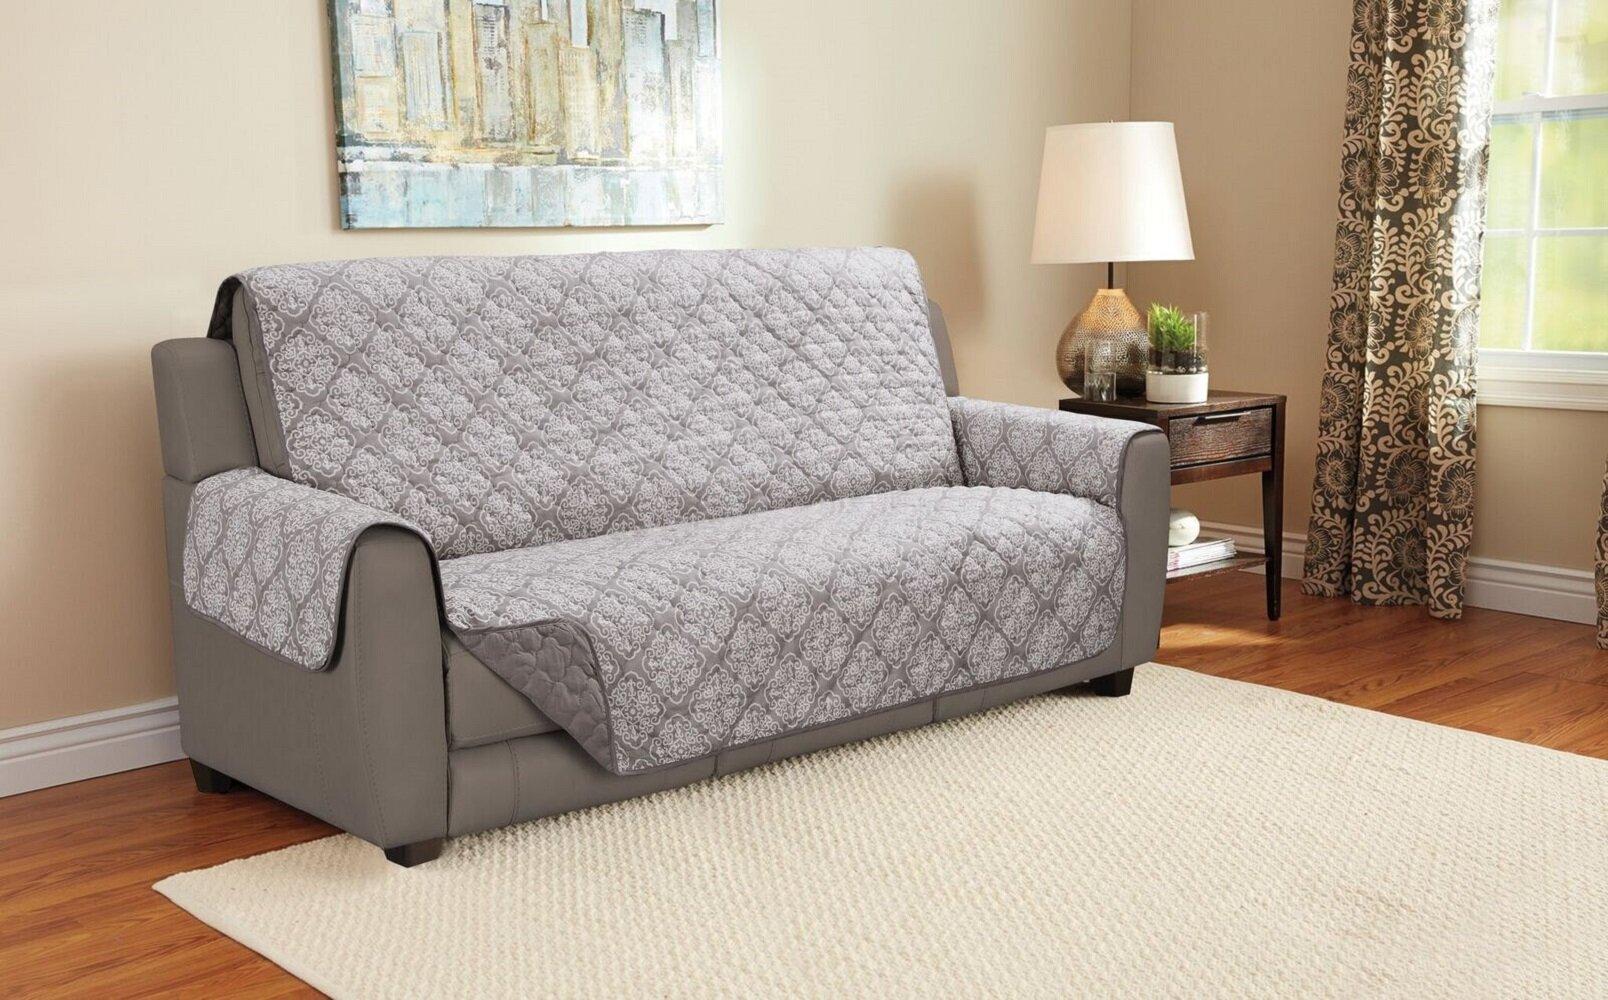 Charlton Home Giambrone Furniture Protector Sofa Slipcover Reviews Wayfair